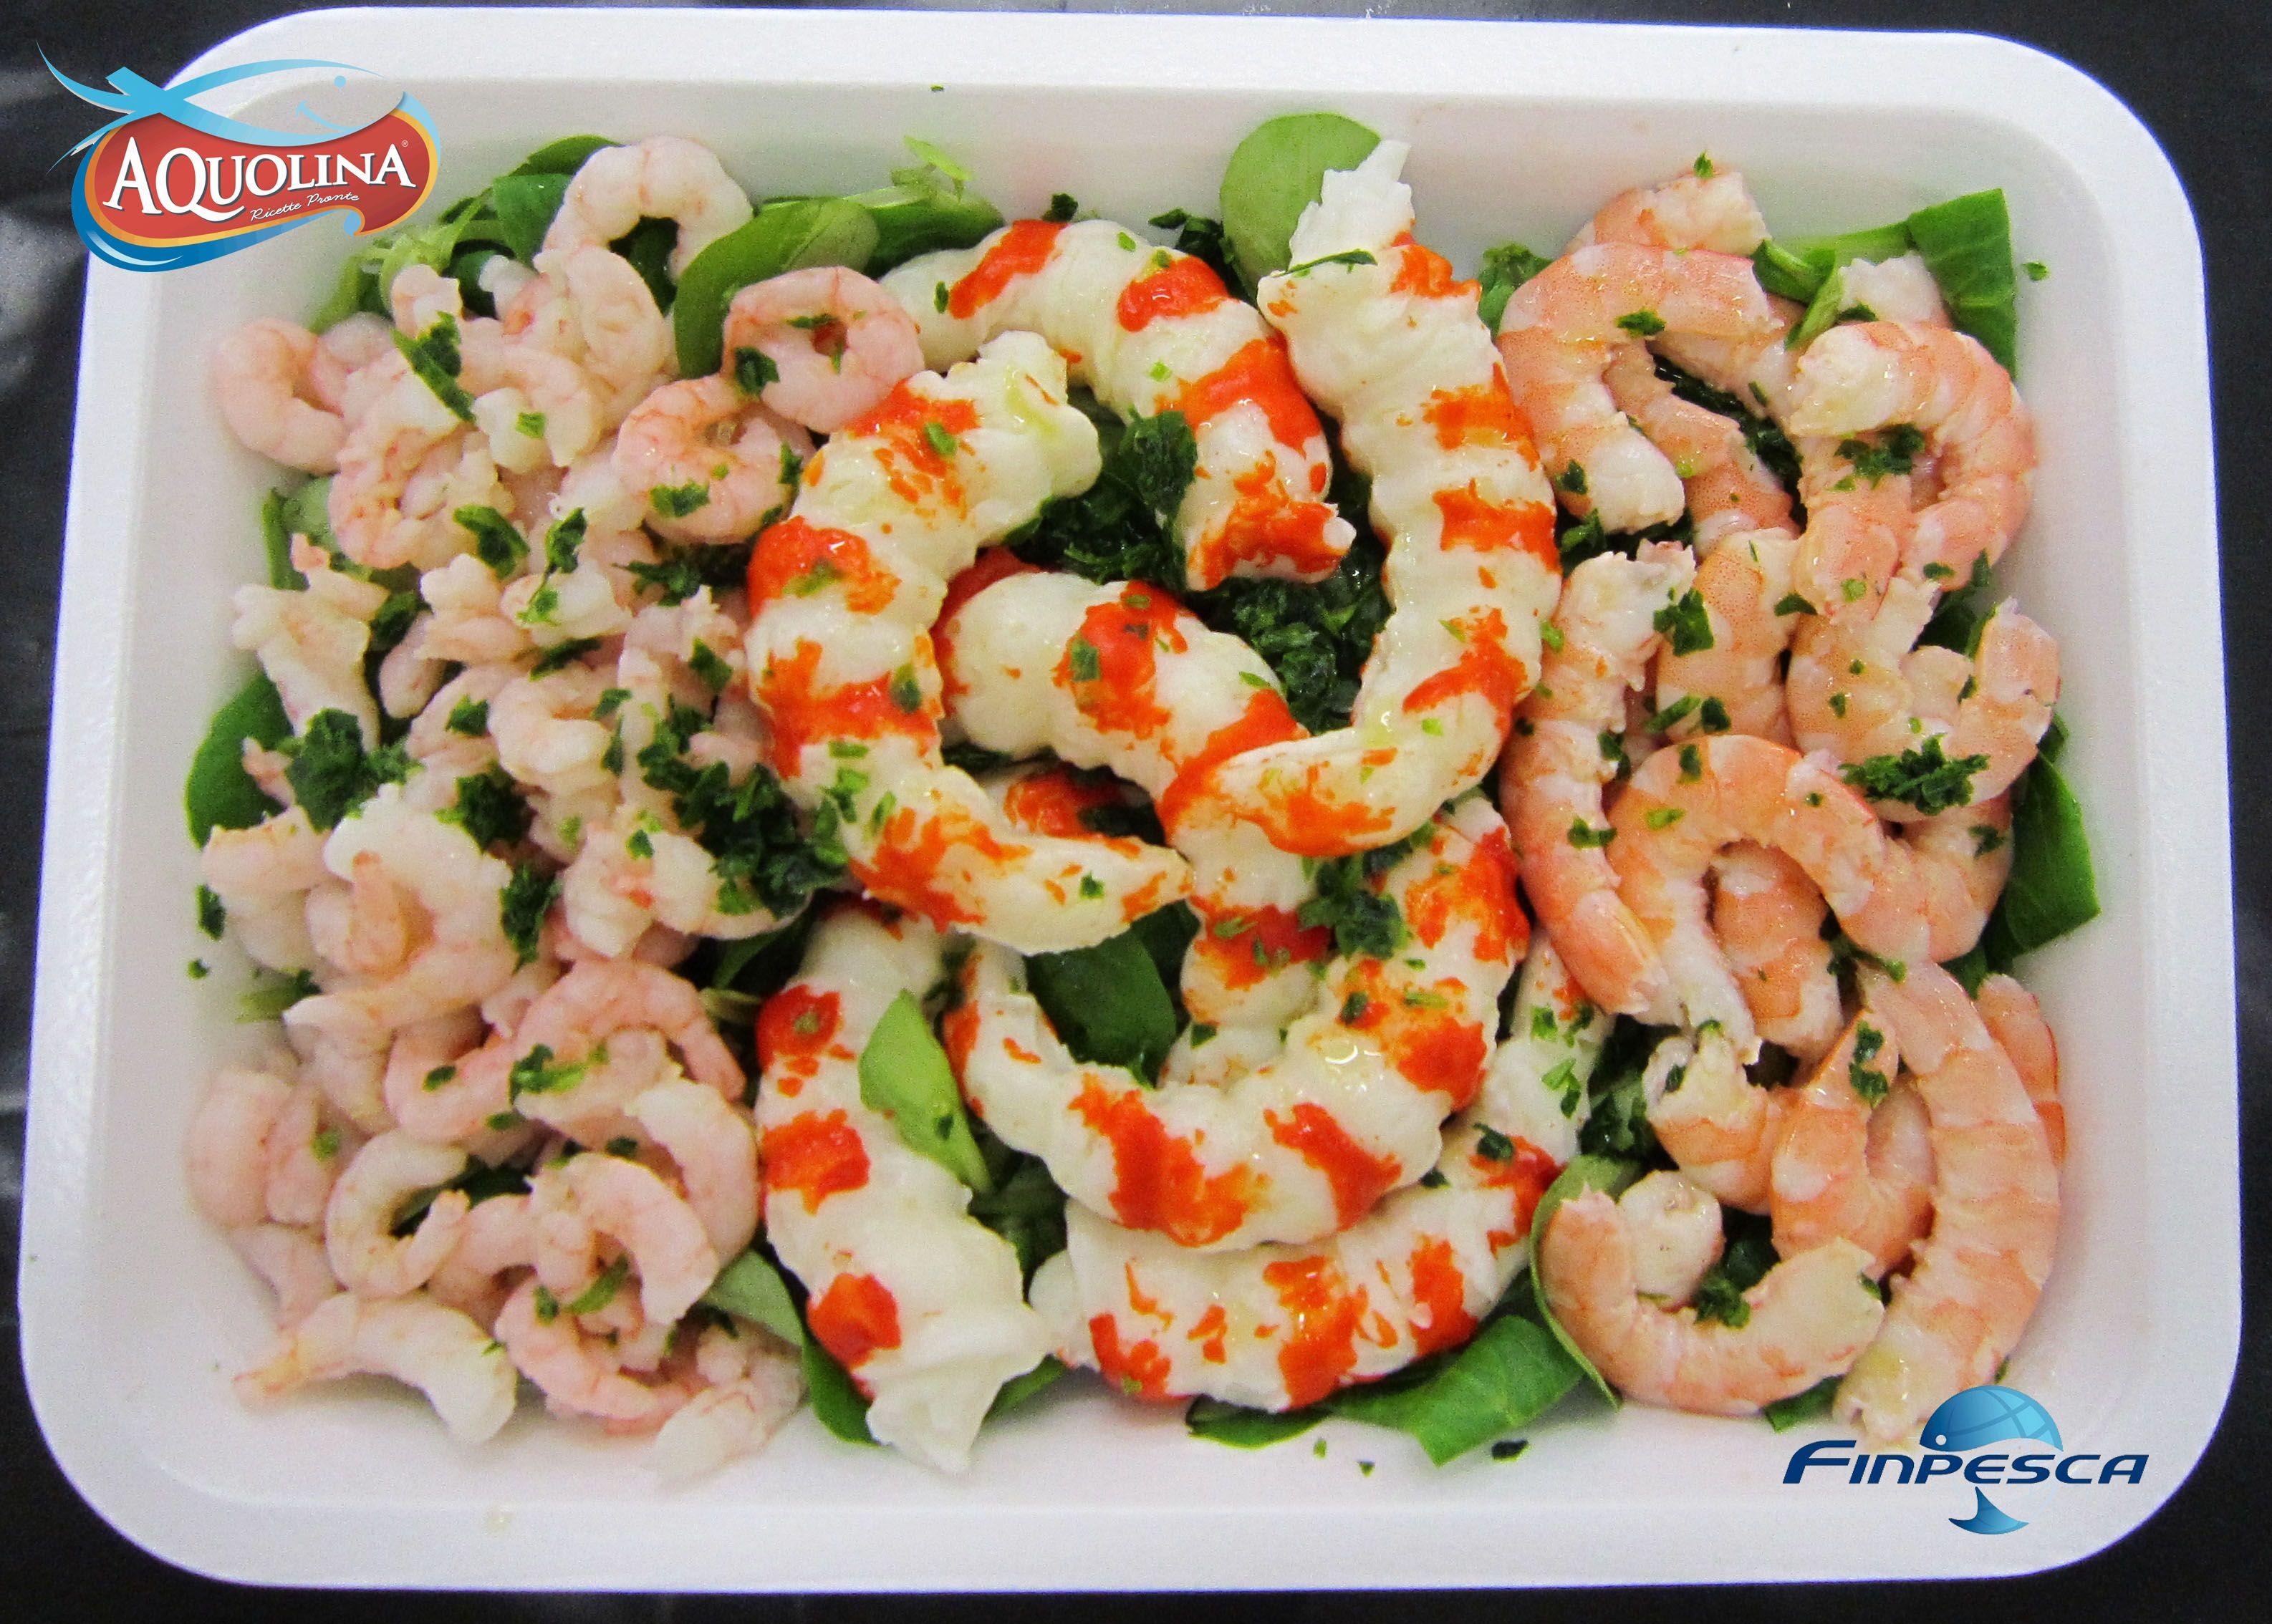 Che ne dite di una bella insalata di gamberi AQUOLINA?  #gamberi #pesce #ricettepesce   http://www.aquolinafinpesca.com/index.htm